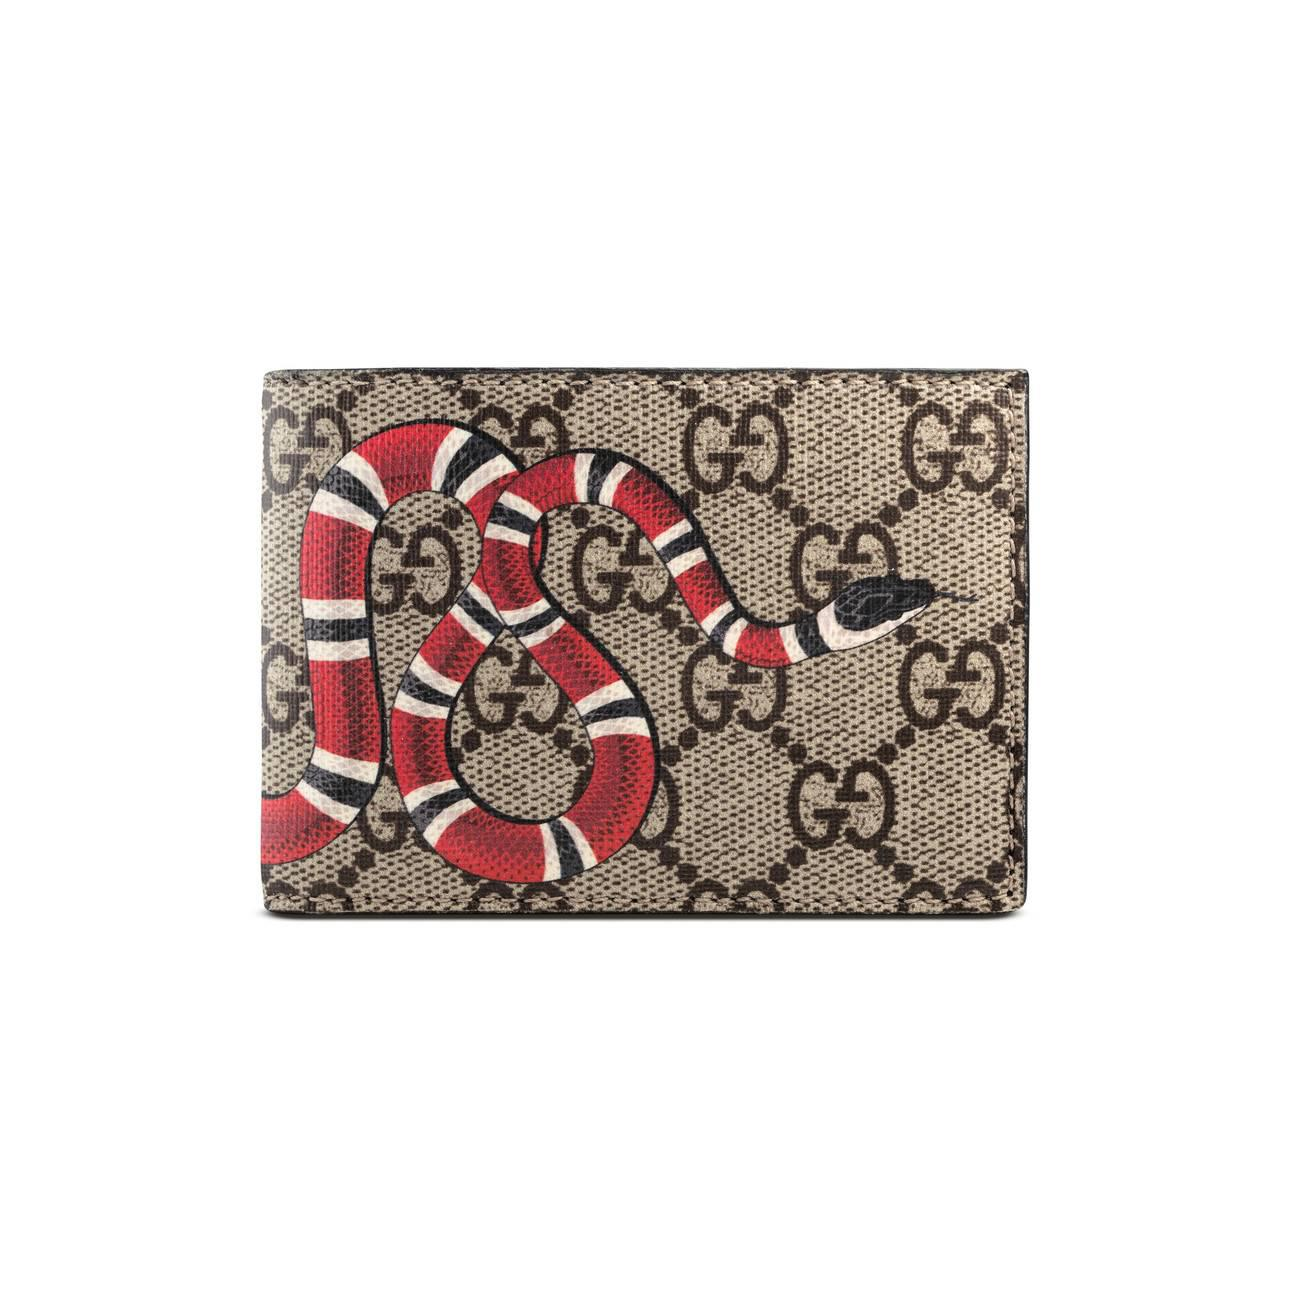 cc8dbf64201 Lyst - Gucci Kingsnake Print Gg Supreme Wallet in Black for Men